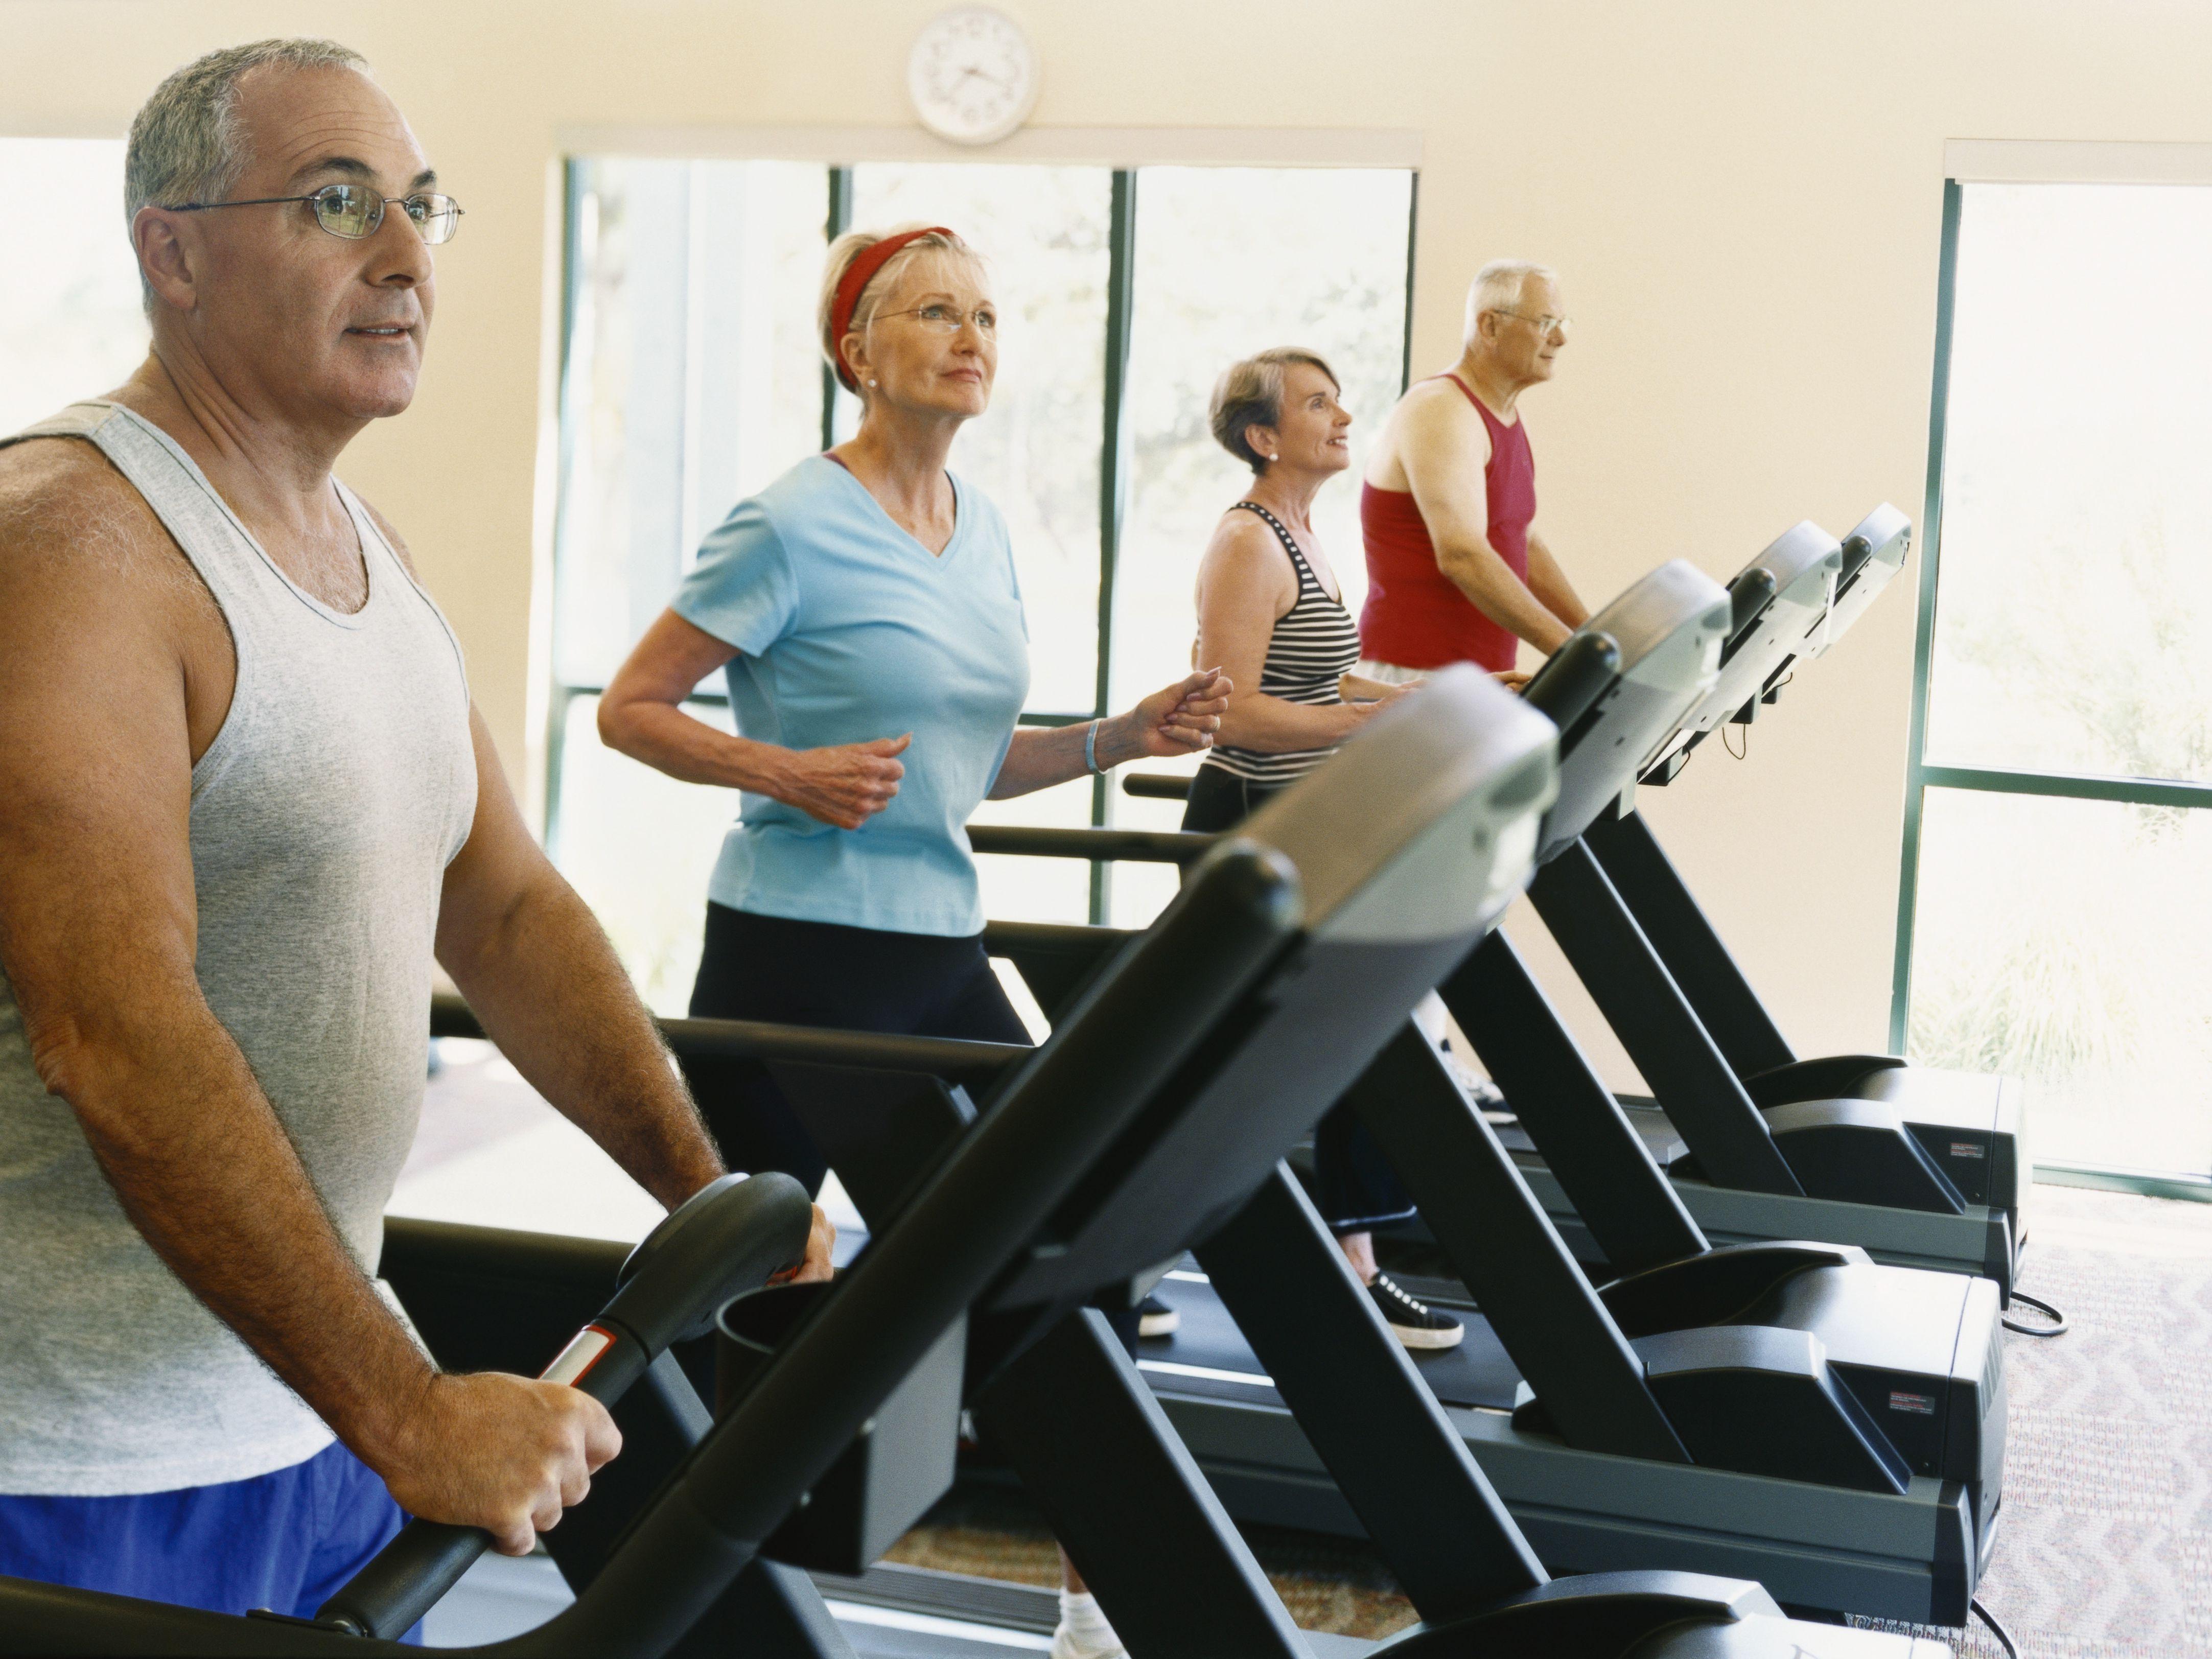 Treadmill Walking Workout Plan for Seniors